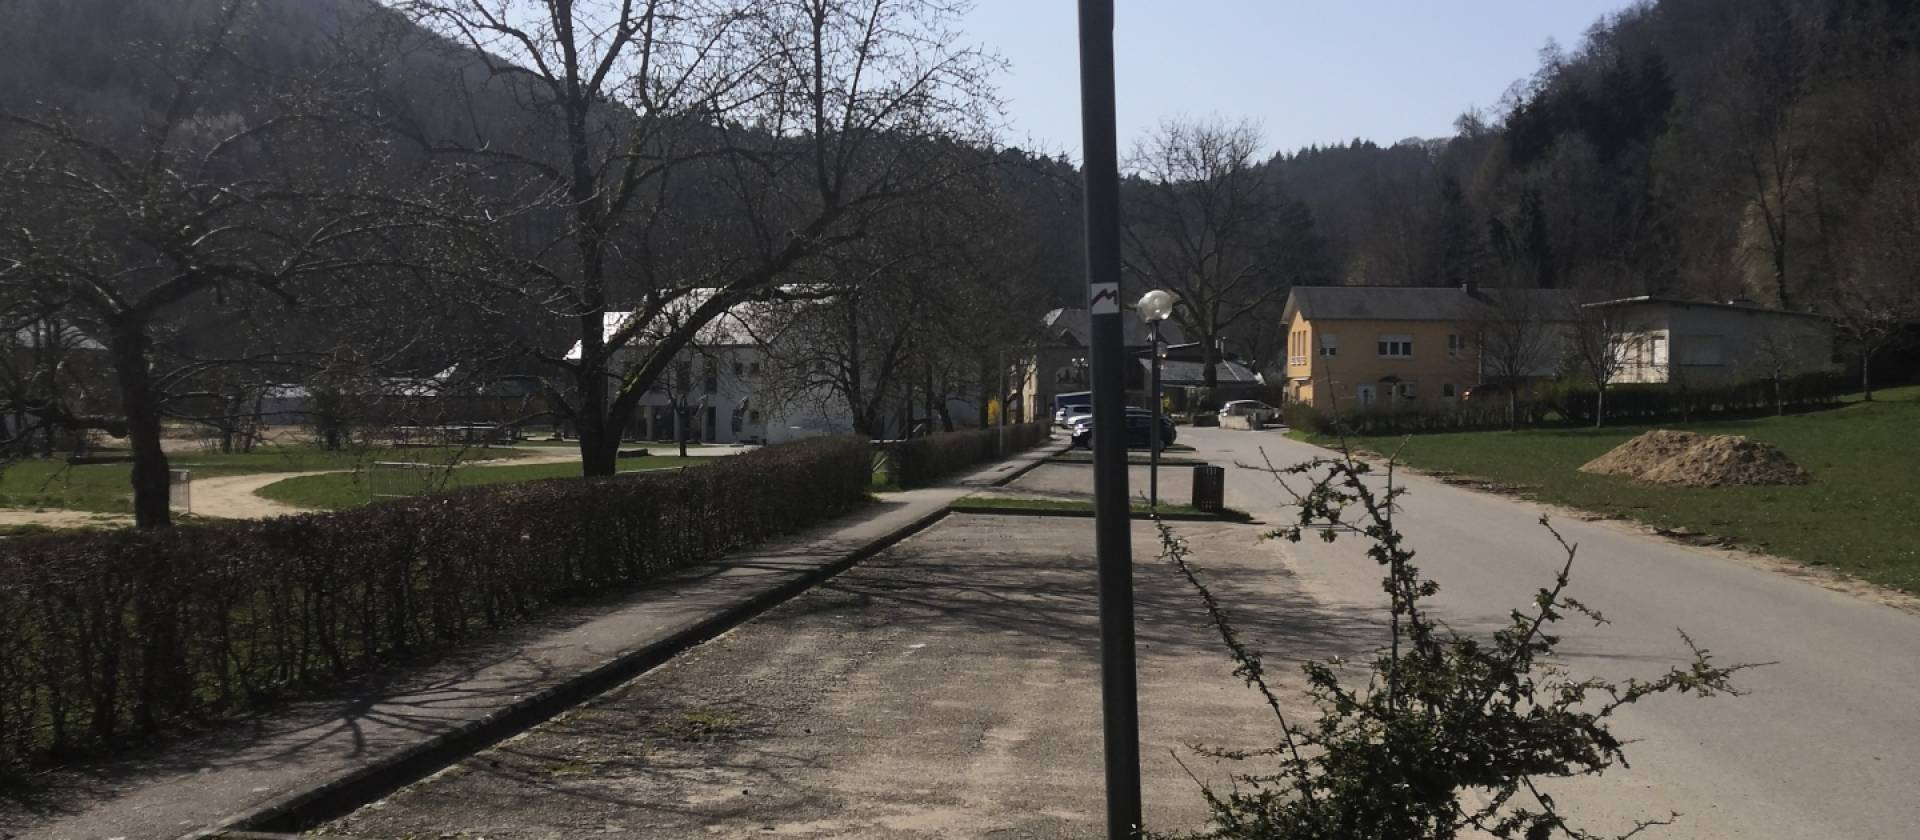 touristcenter heringer millen parking